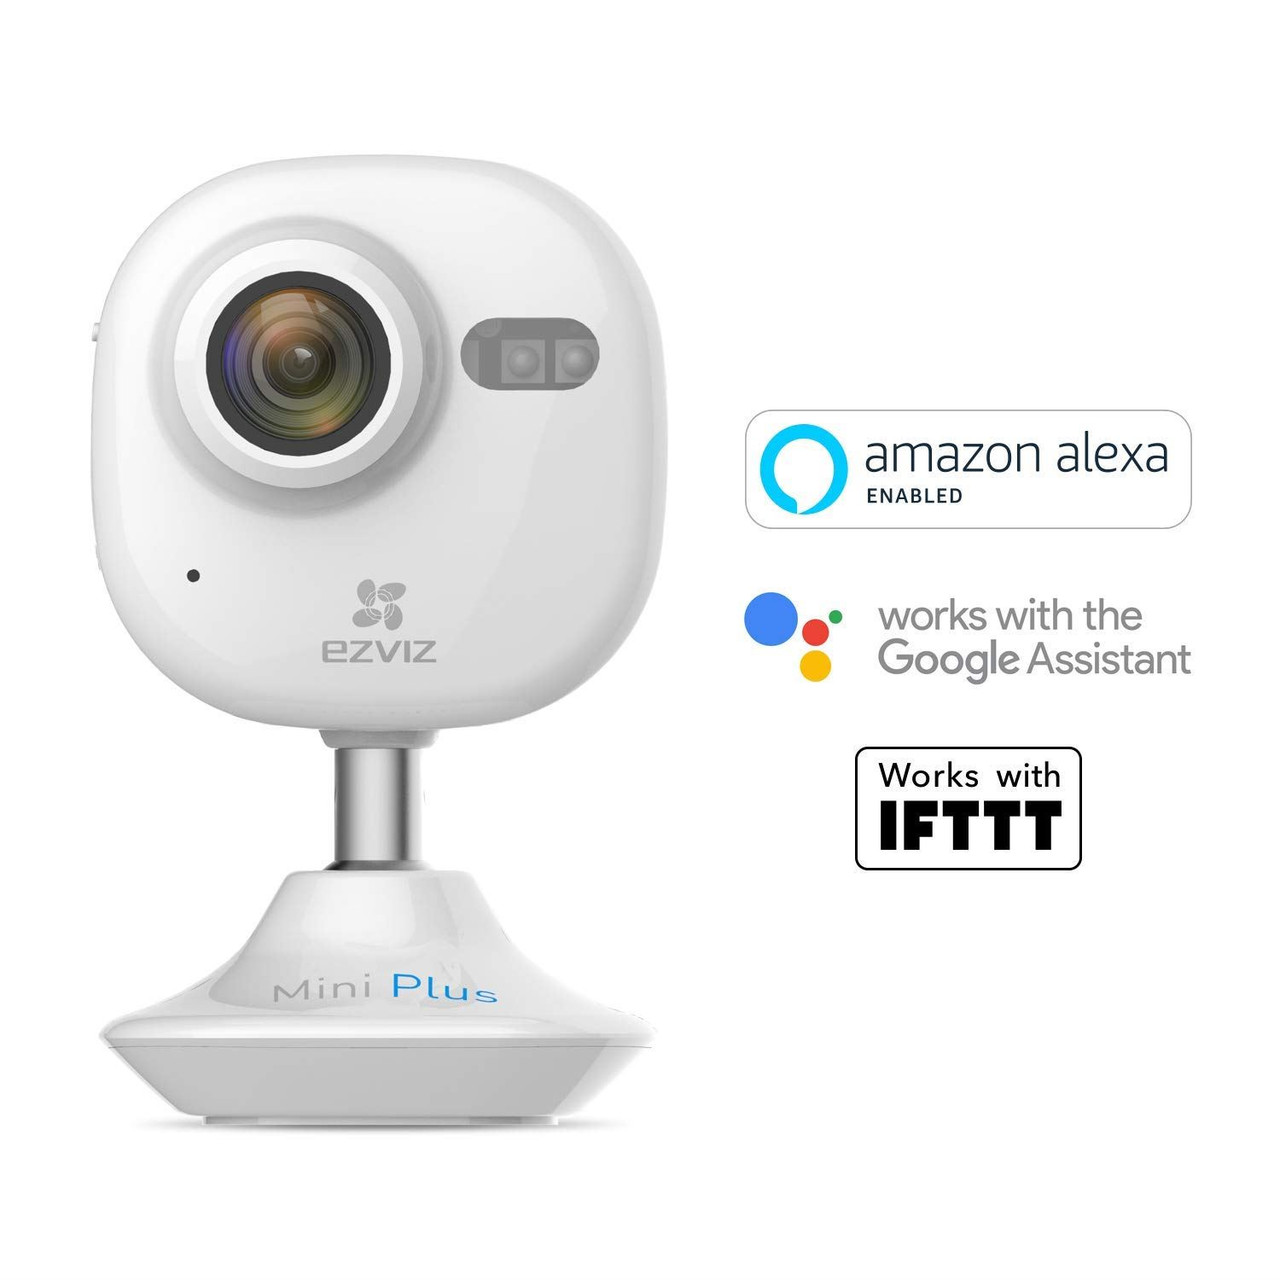 EZVIZ Mini Plus White, 1080p WiFi Smart Home Security Camera, Works with  Alexa